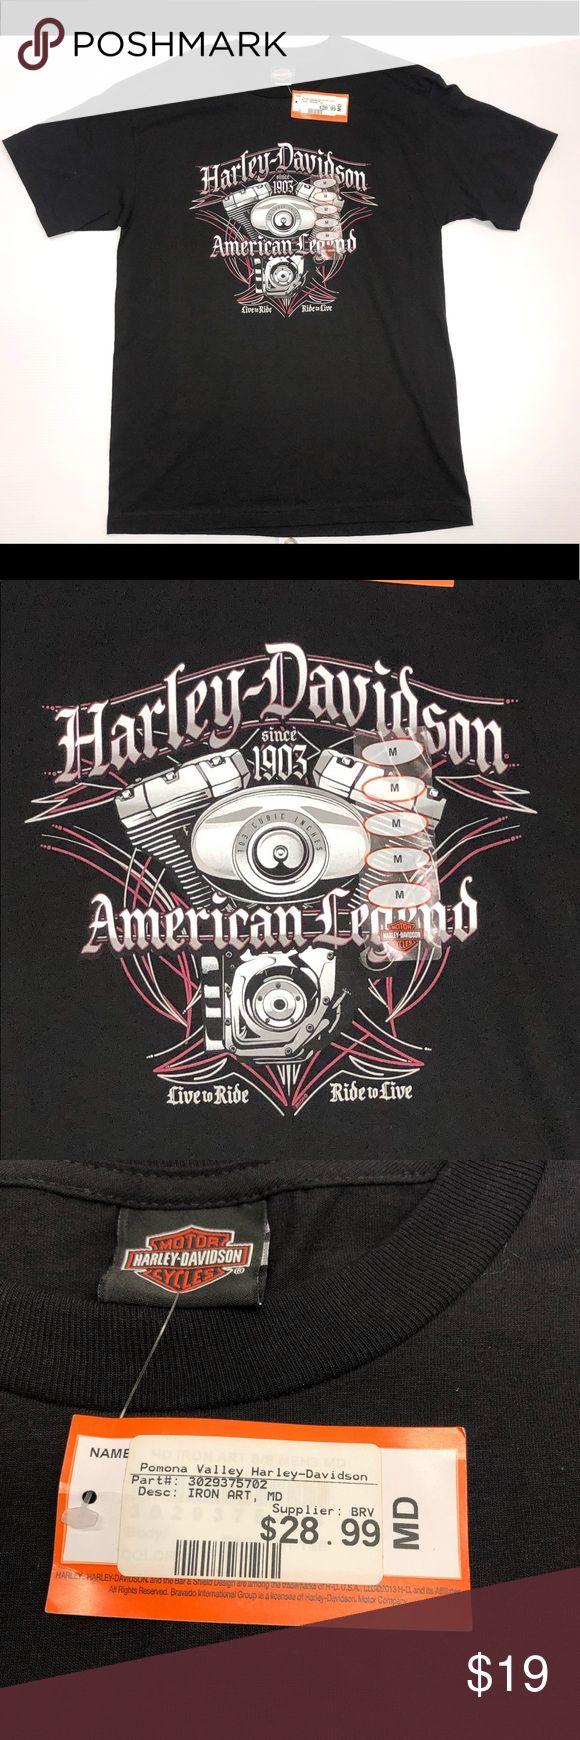 Harley-Davidson Motorcycles Herren Schwarzes T-Shirt Harley-Davidson Motorcycles Herren …   – My Posh Picks